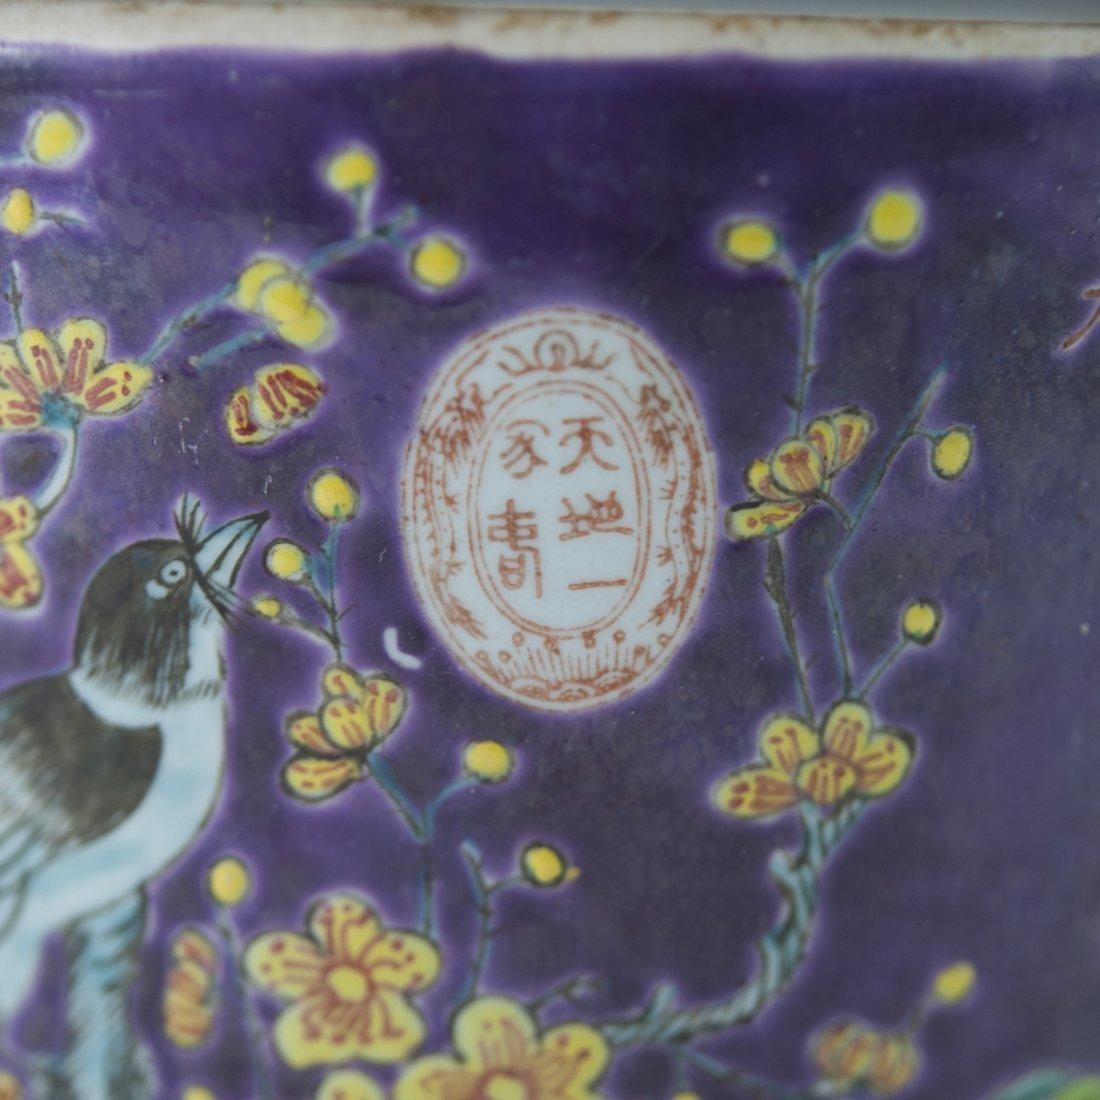 Chinese Porcelain Daya Zhai Cache Pot - 2